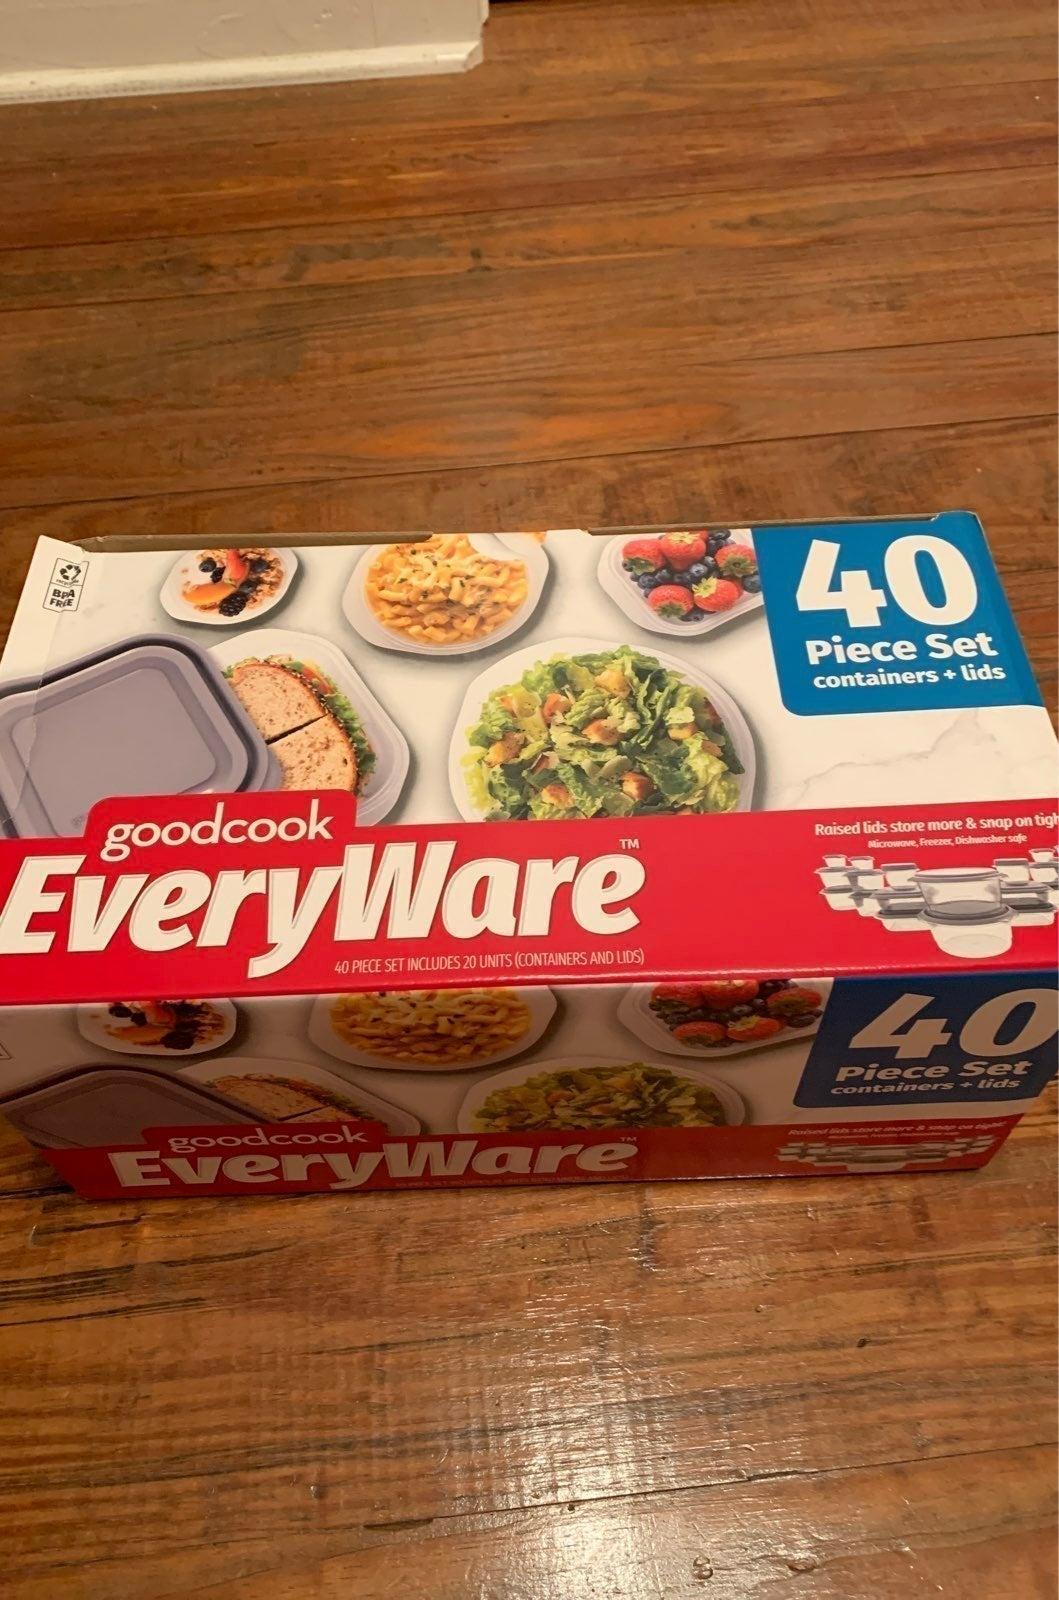 New goodcook EveryWare 40 piece set